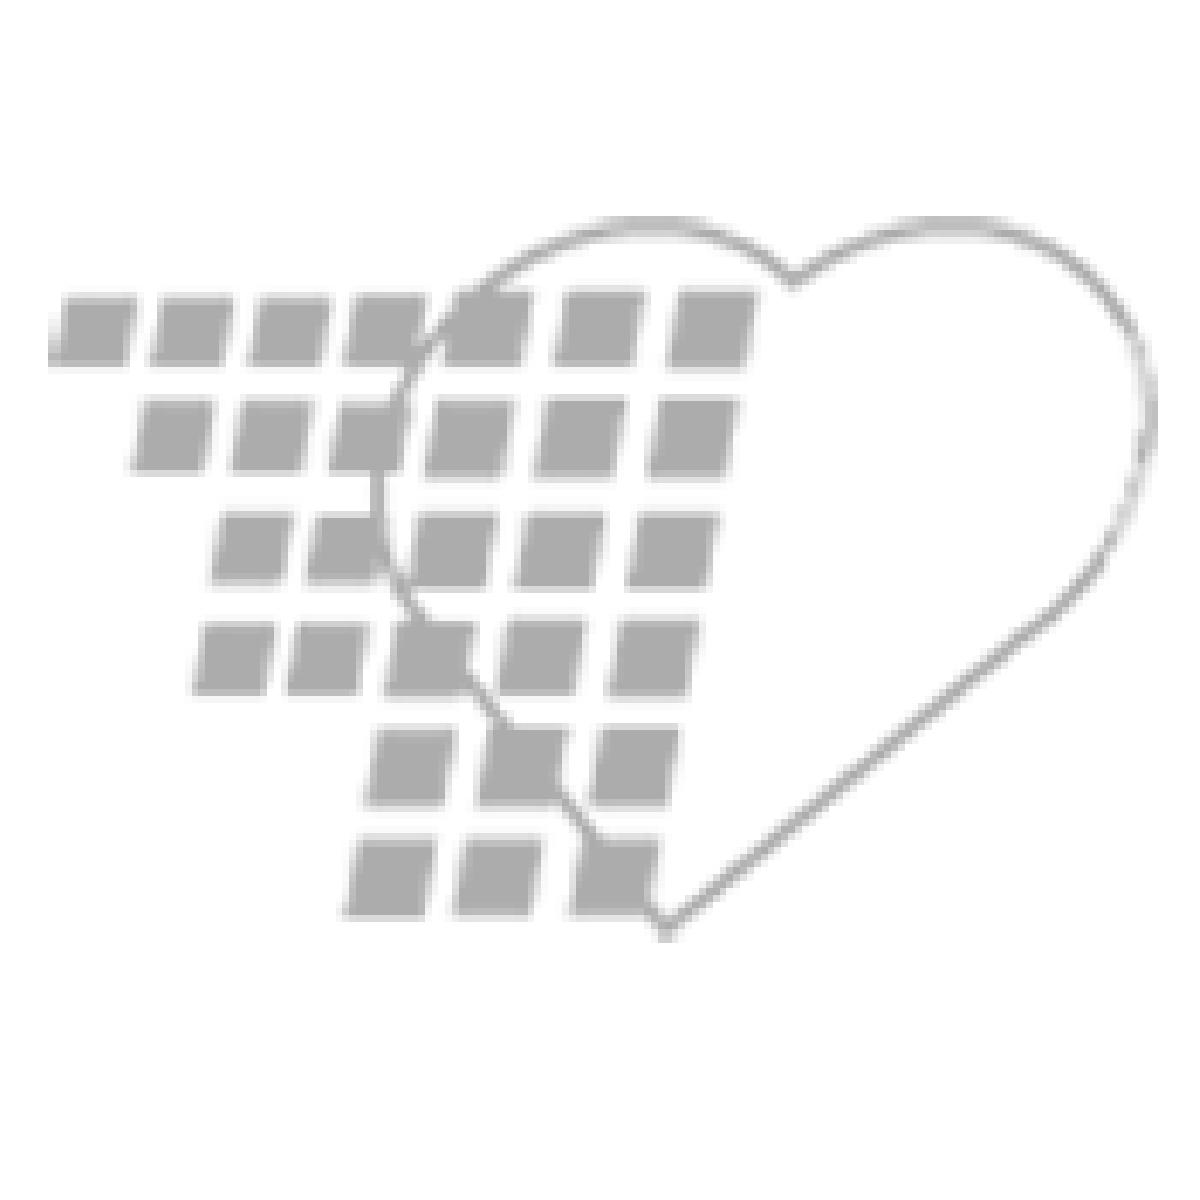 03-32-2480 SaniGuard® Dry On Contact Sanitizing Spray - (ships ORMD)